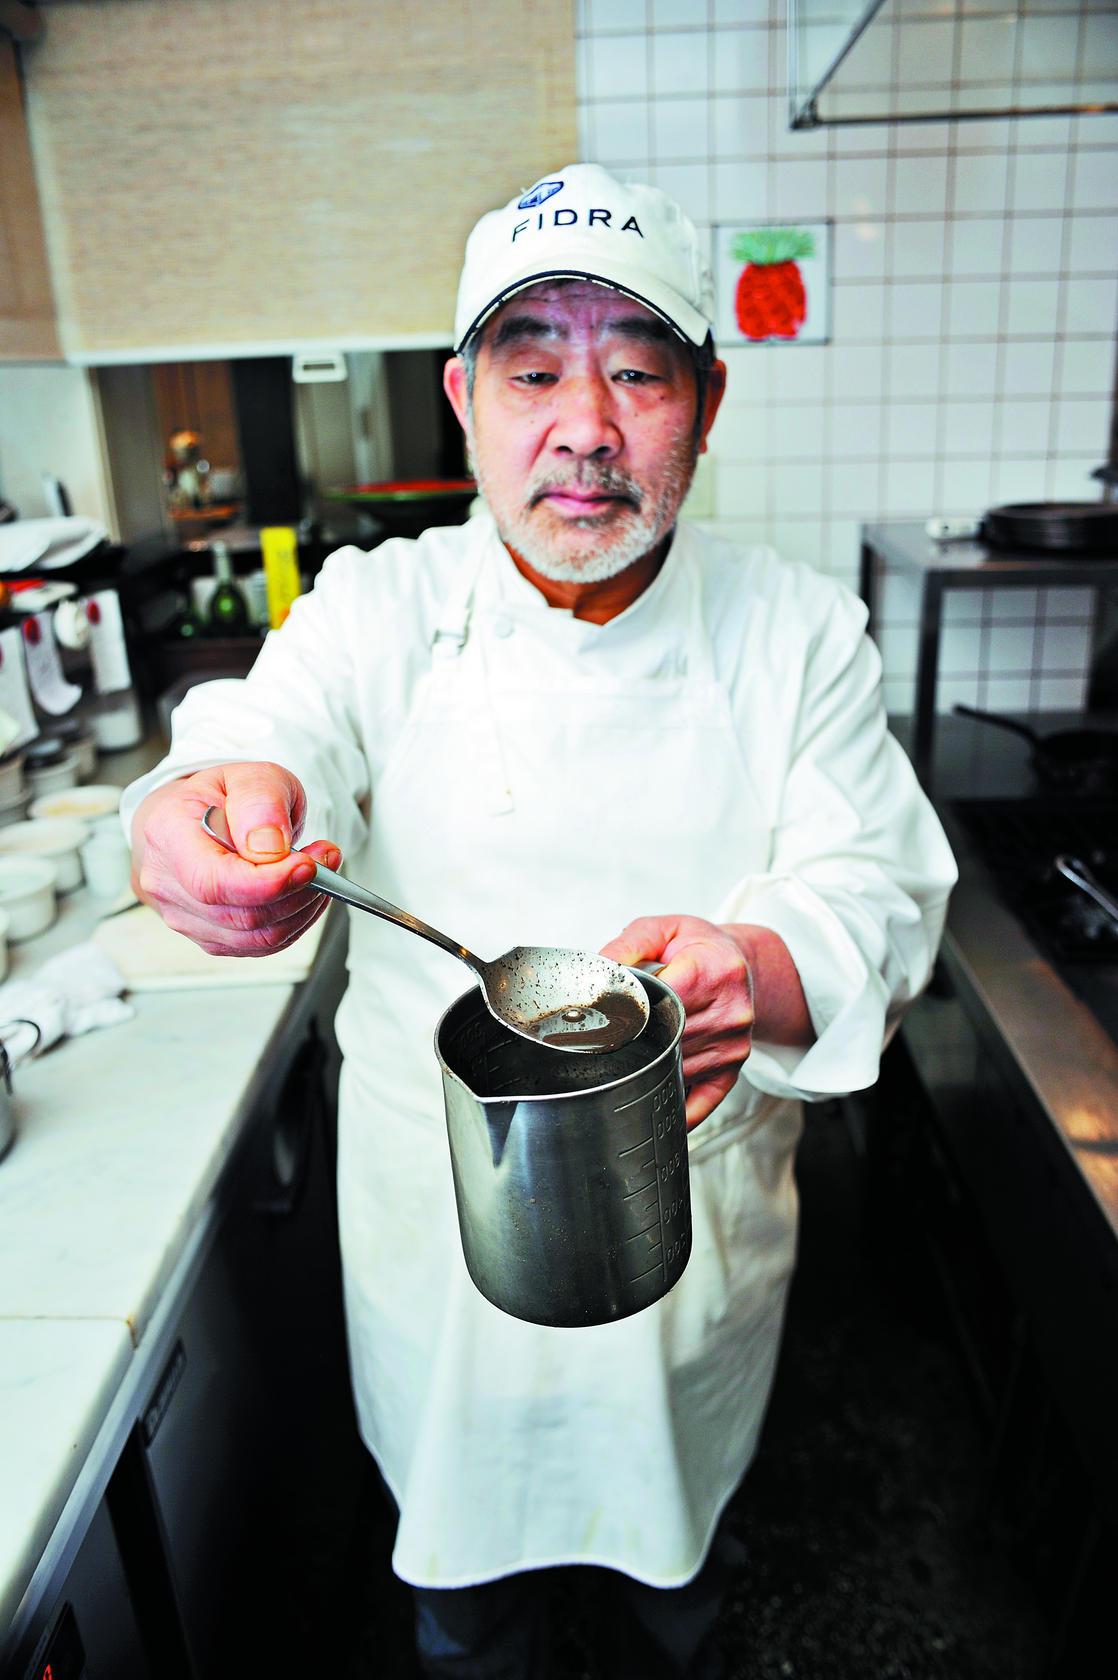 Dishing the dirt | South China Morning Post